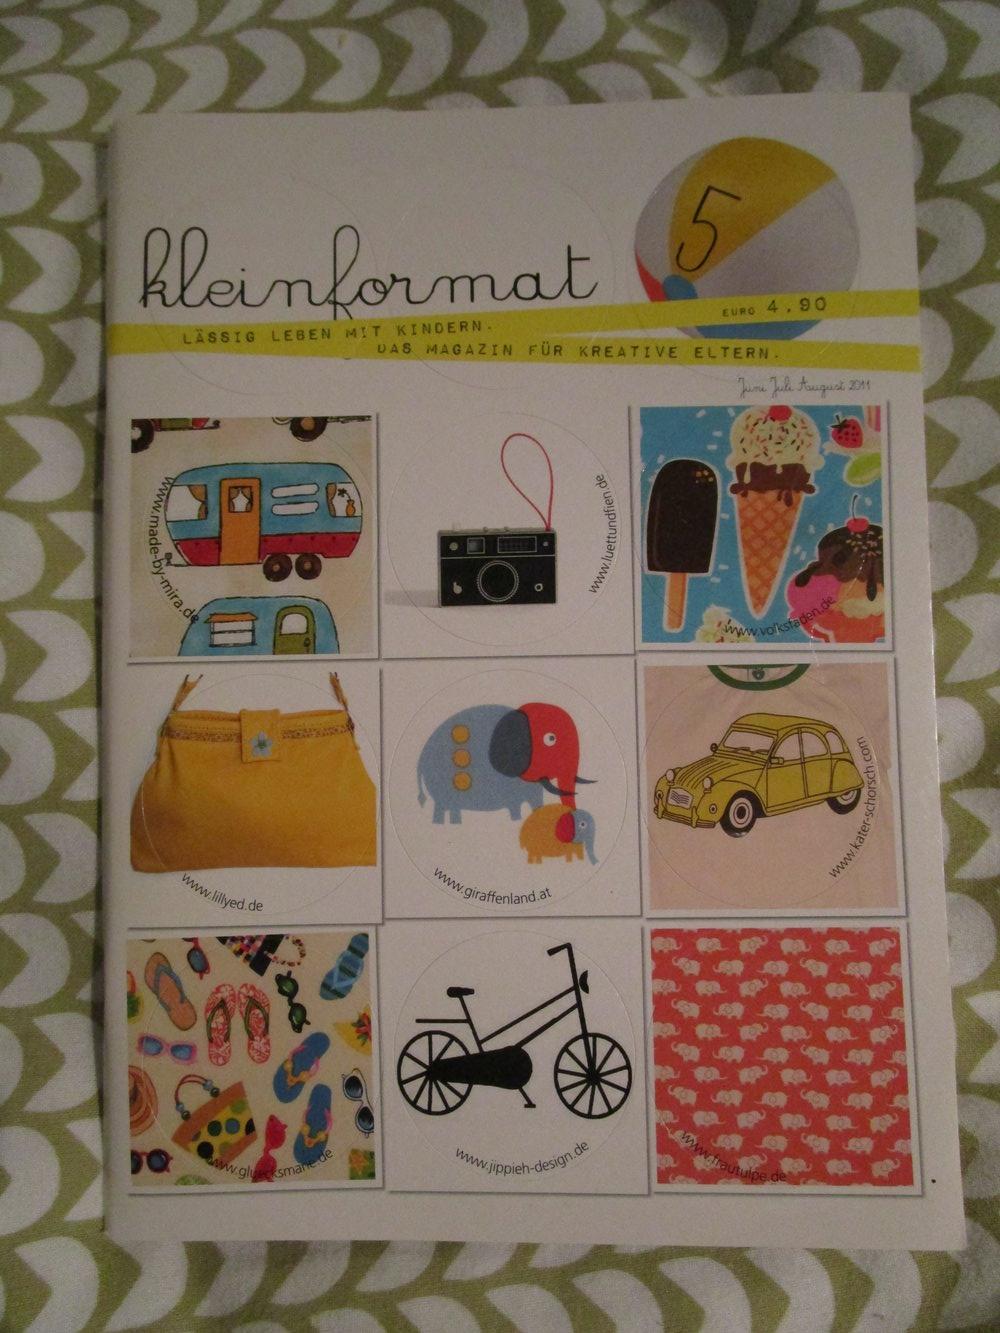 kleinformat 5 magazin zeitschrift kreative eltern diy kinder erziehung selbstgemacht hip basteln. Black Bedroom Furniture Sets. Home Design Ideas